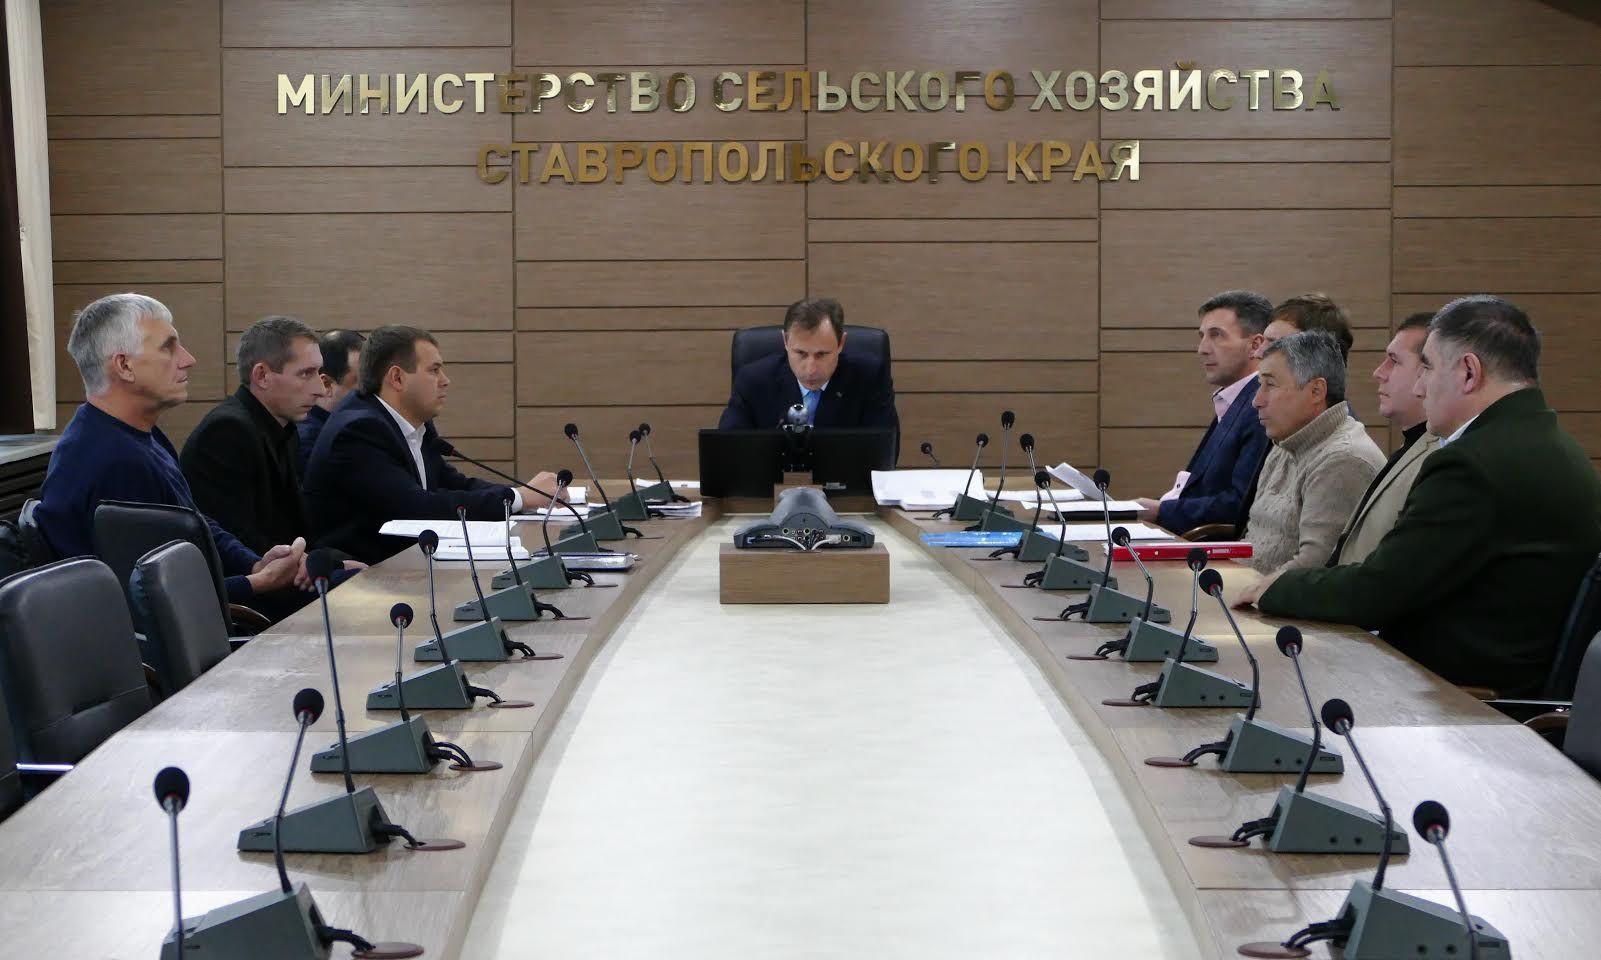 image Знакомства ставрополь край